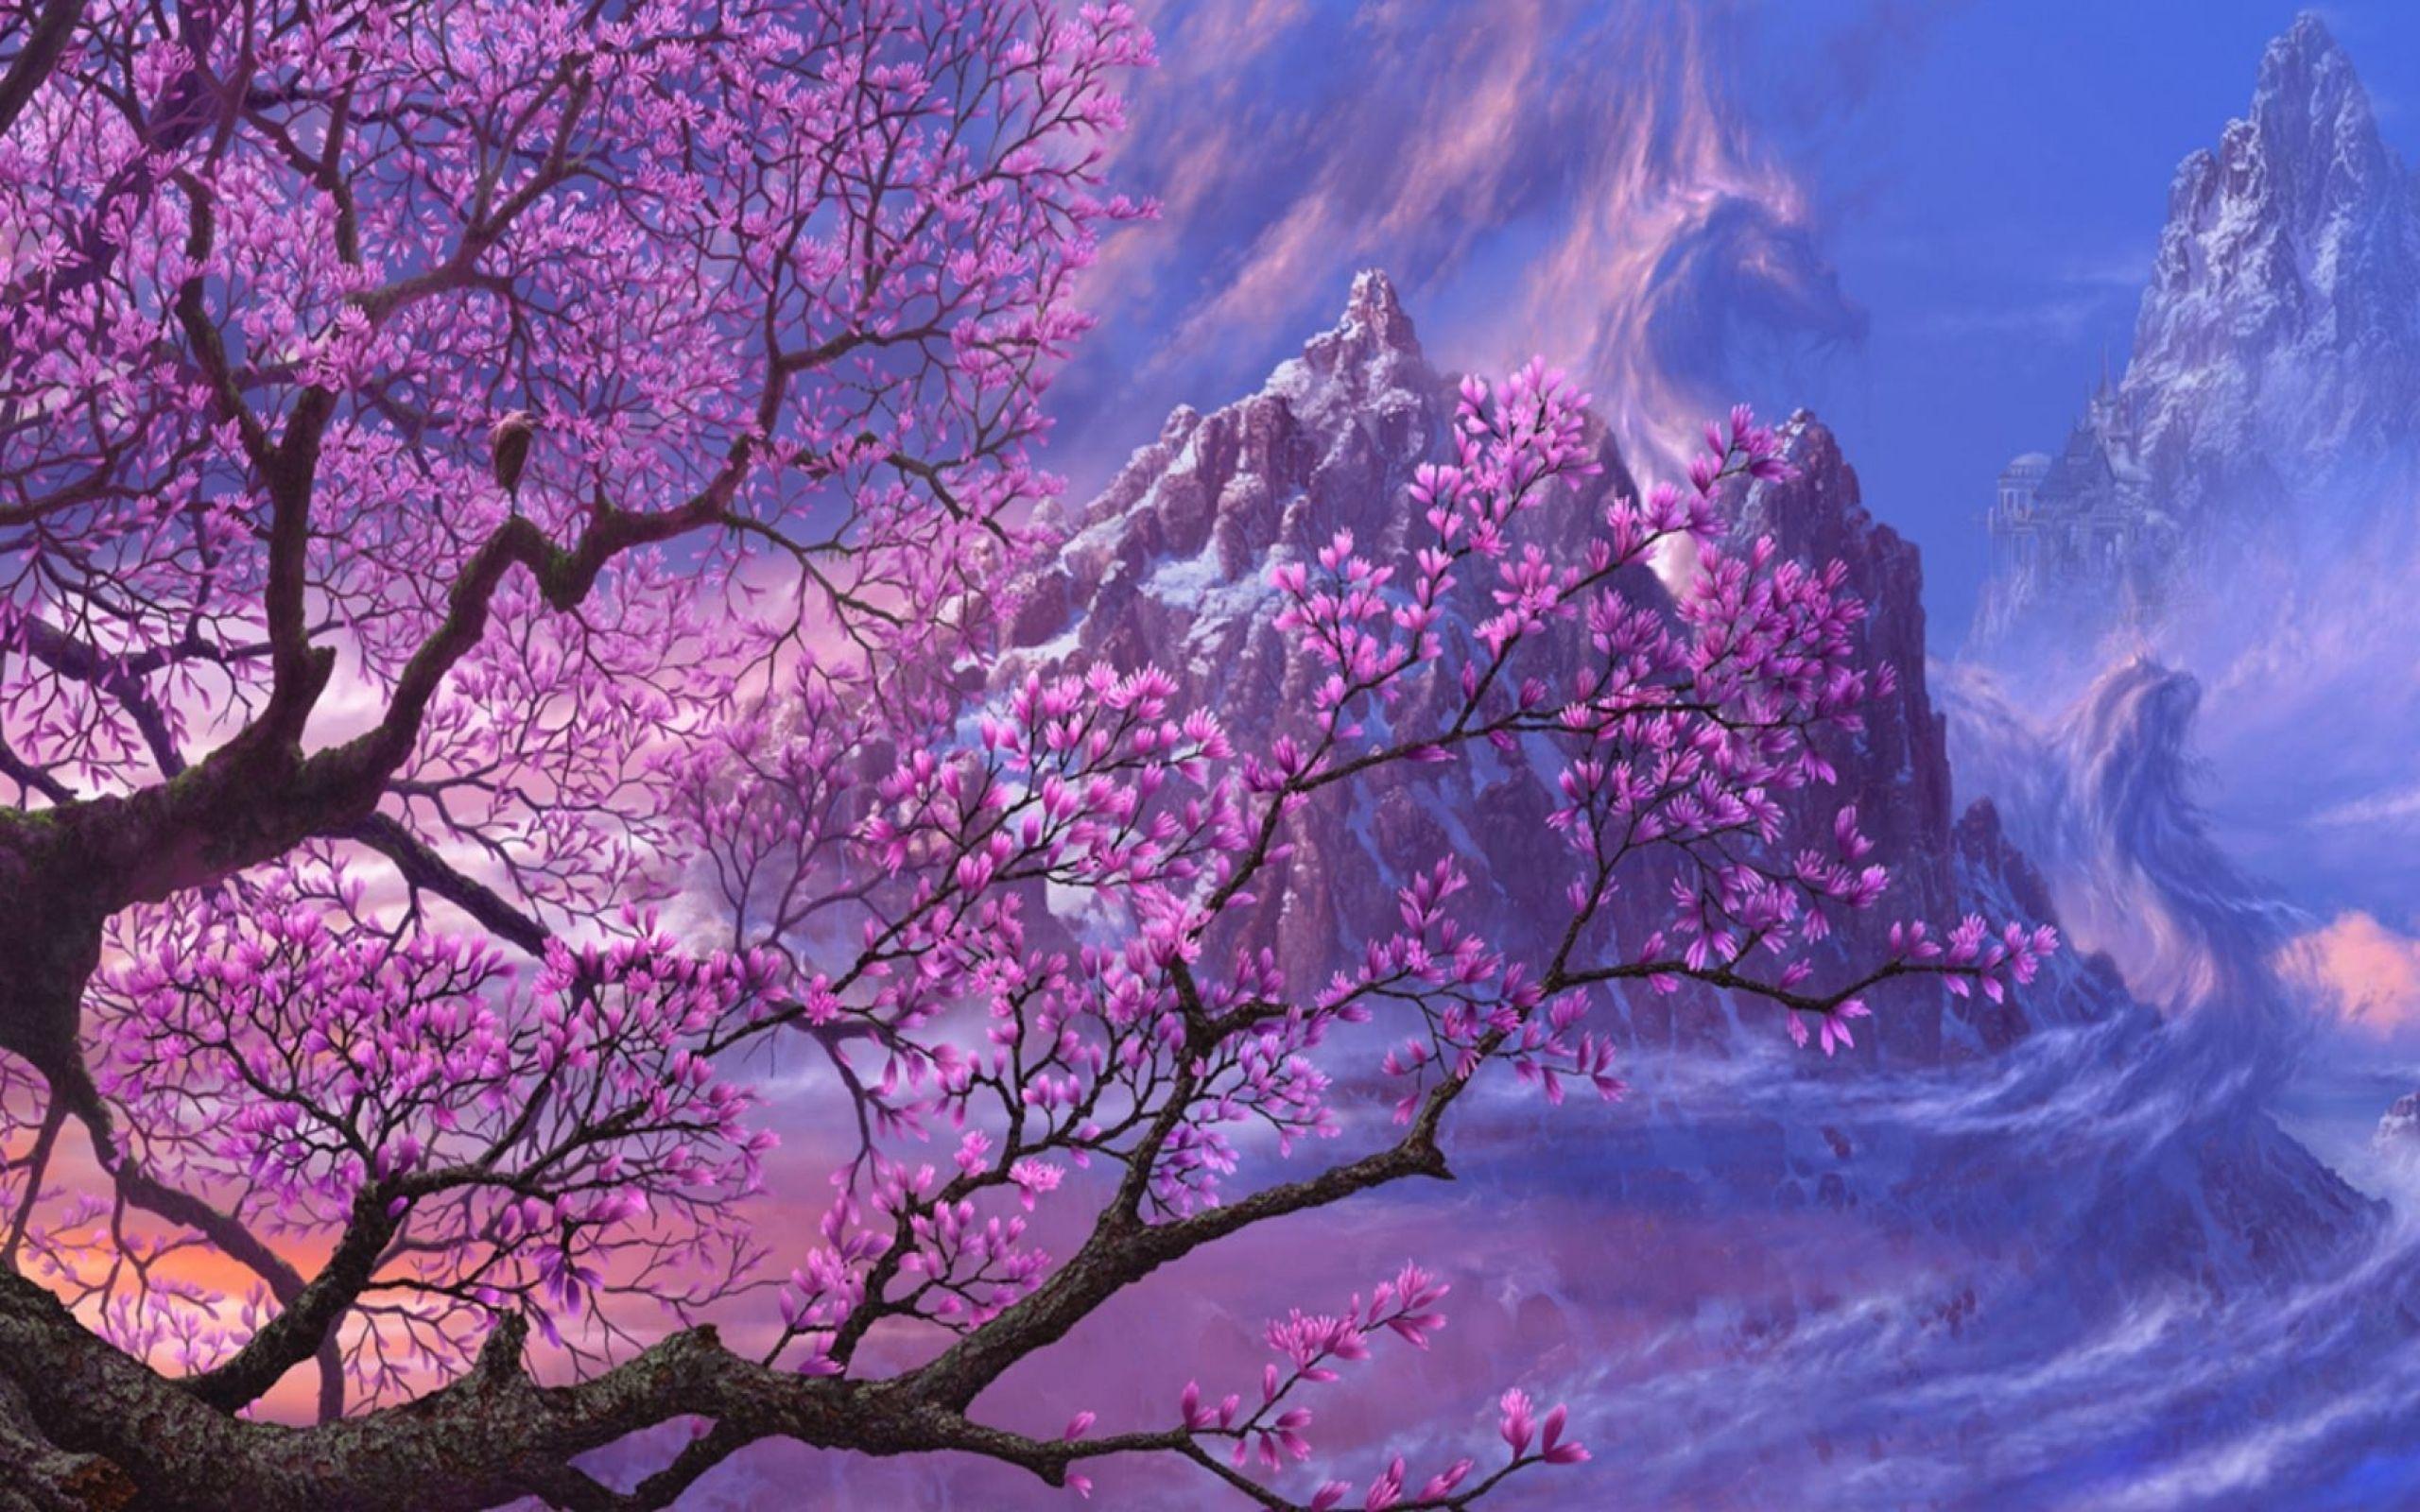 Purple Fantasy Art Asia Artwork Anime 1920x1080 Landscape Wallpaper Fantasy Art Tree Art